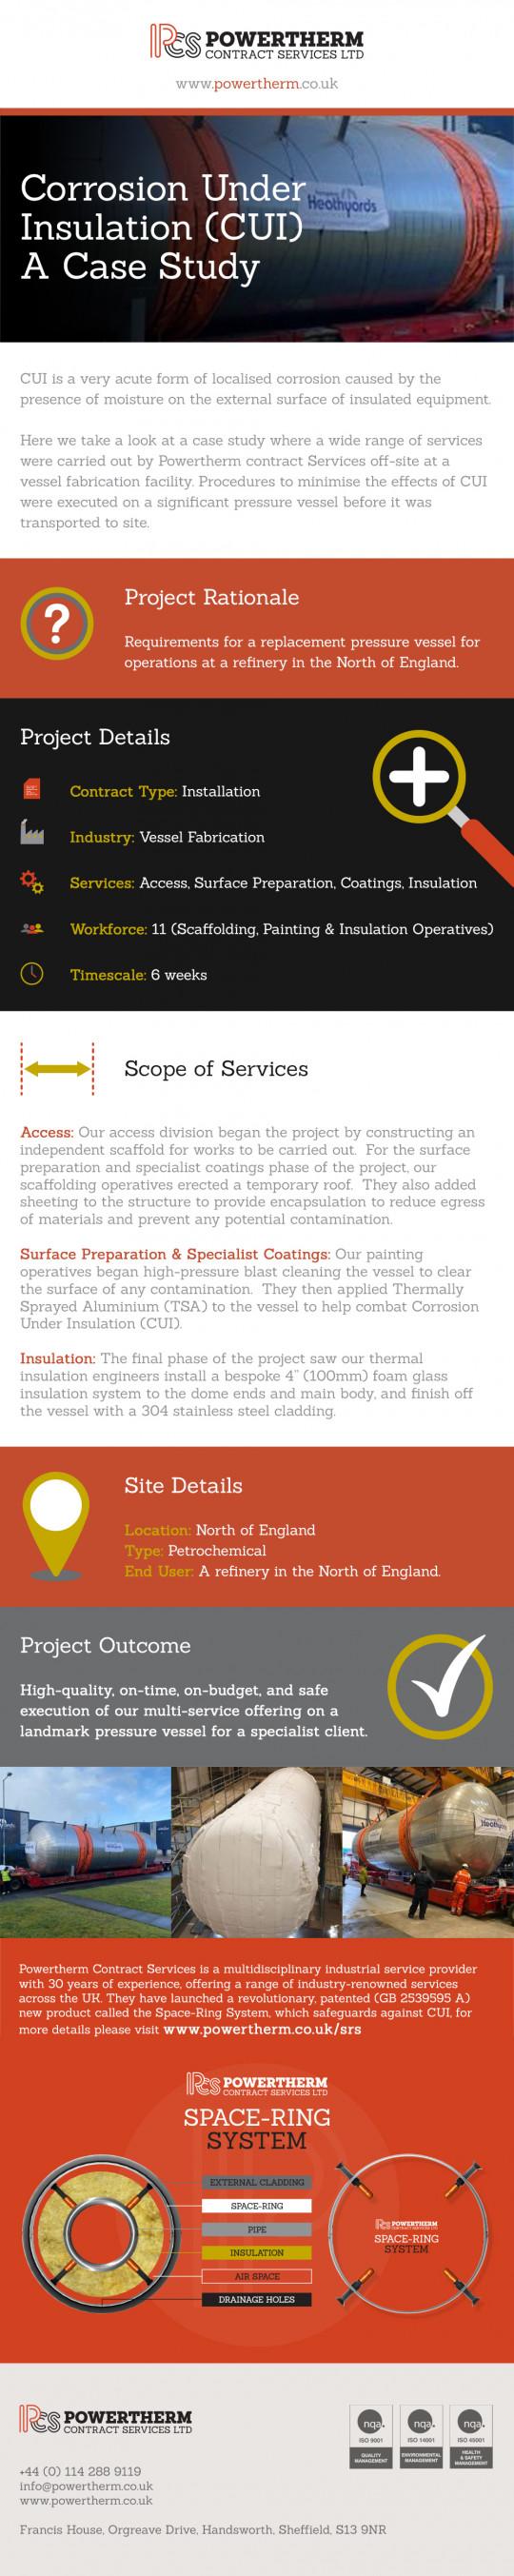 Corrosion Under Insulation (CUI): A Case Study